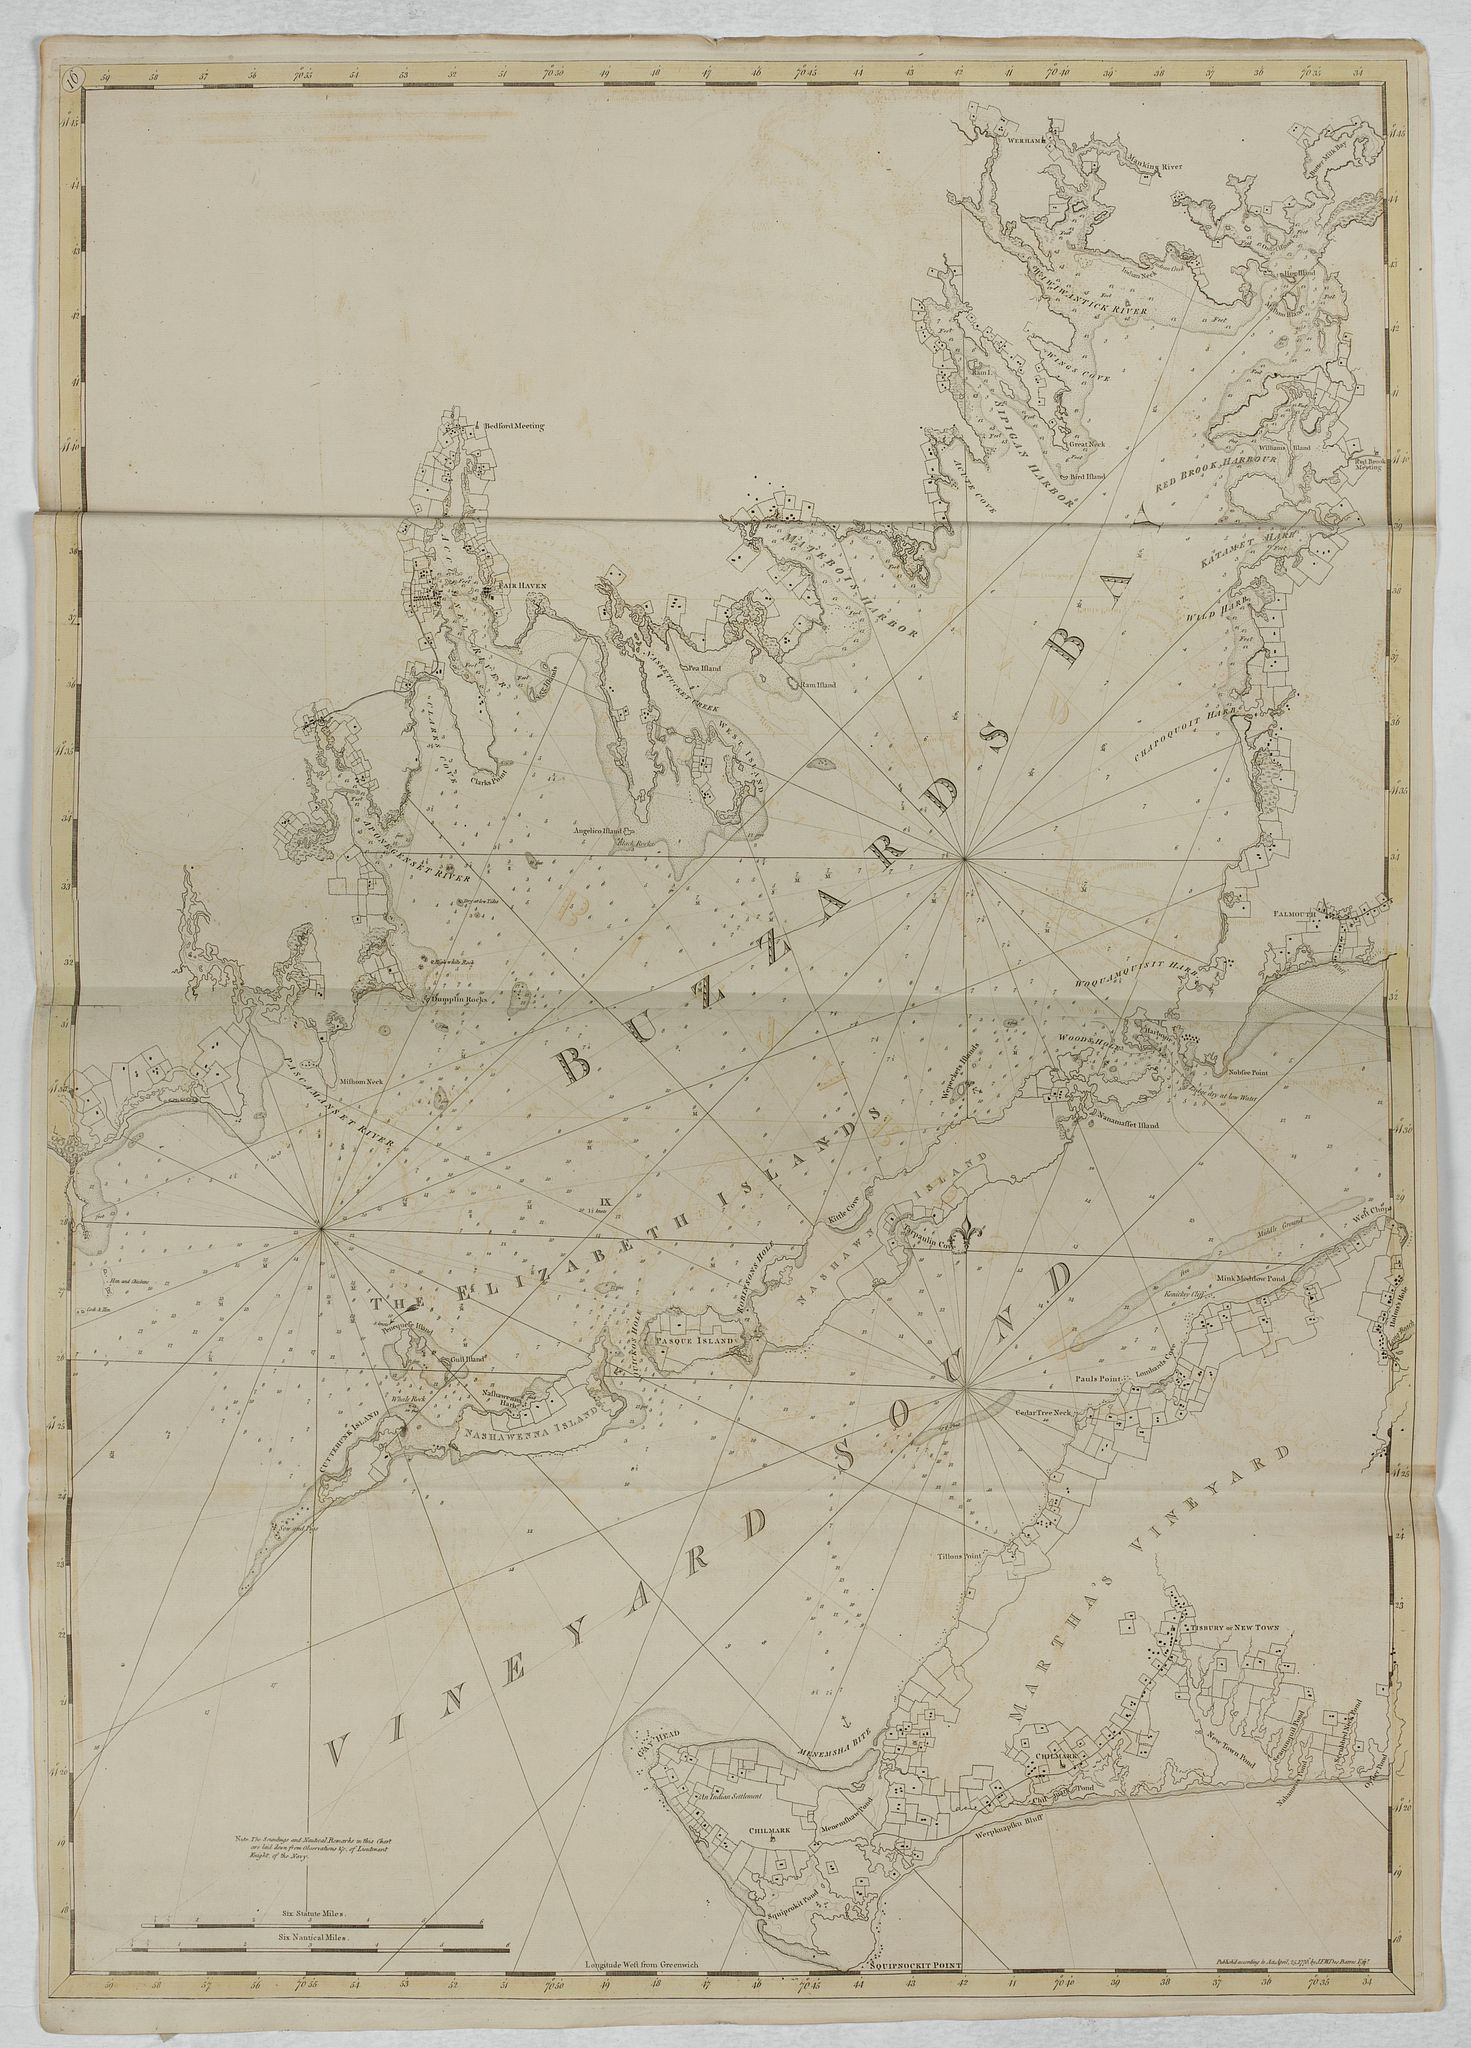 DES BARRES, J.F.W. -  [ Buzzards Bay and Vineyard Sound ]